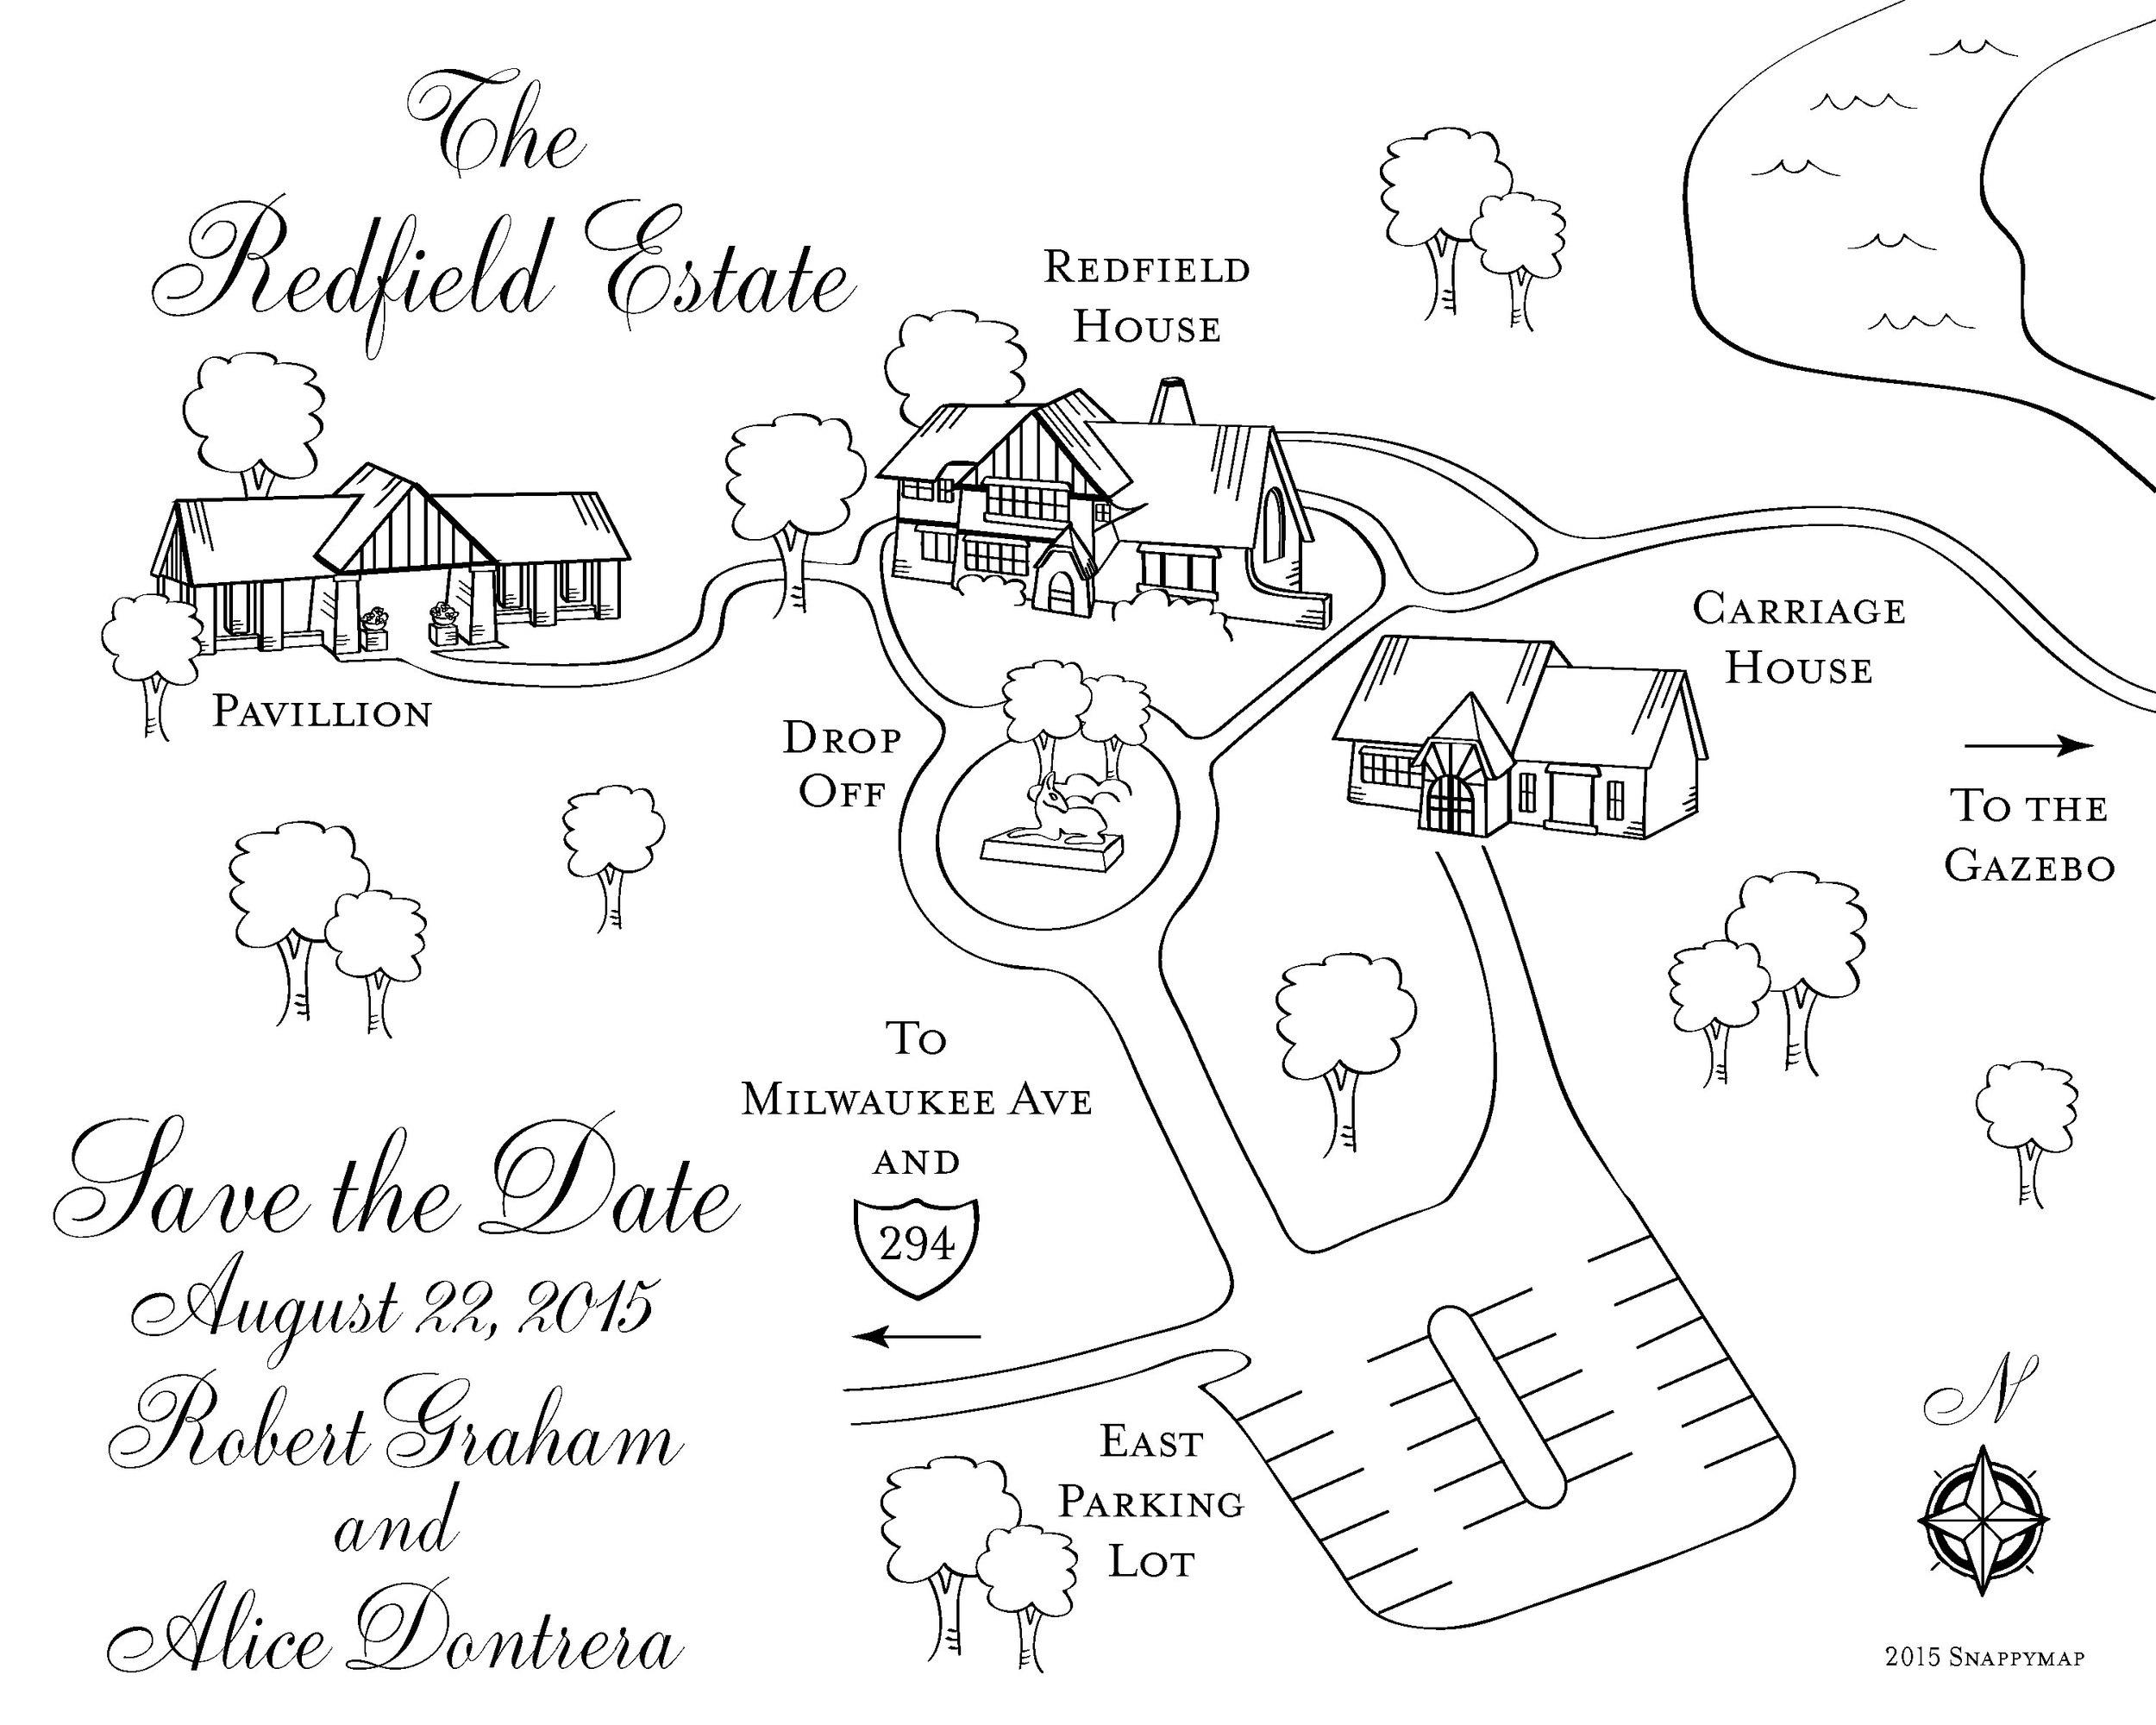 Hand Drawn Map Redfield Estate